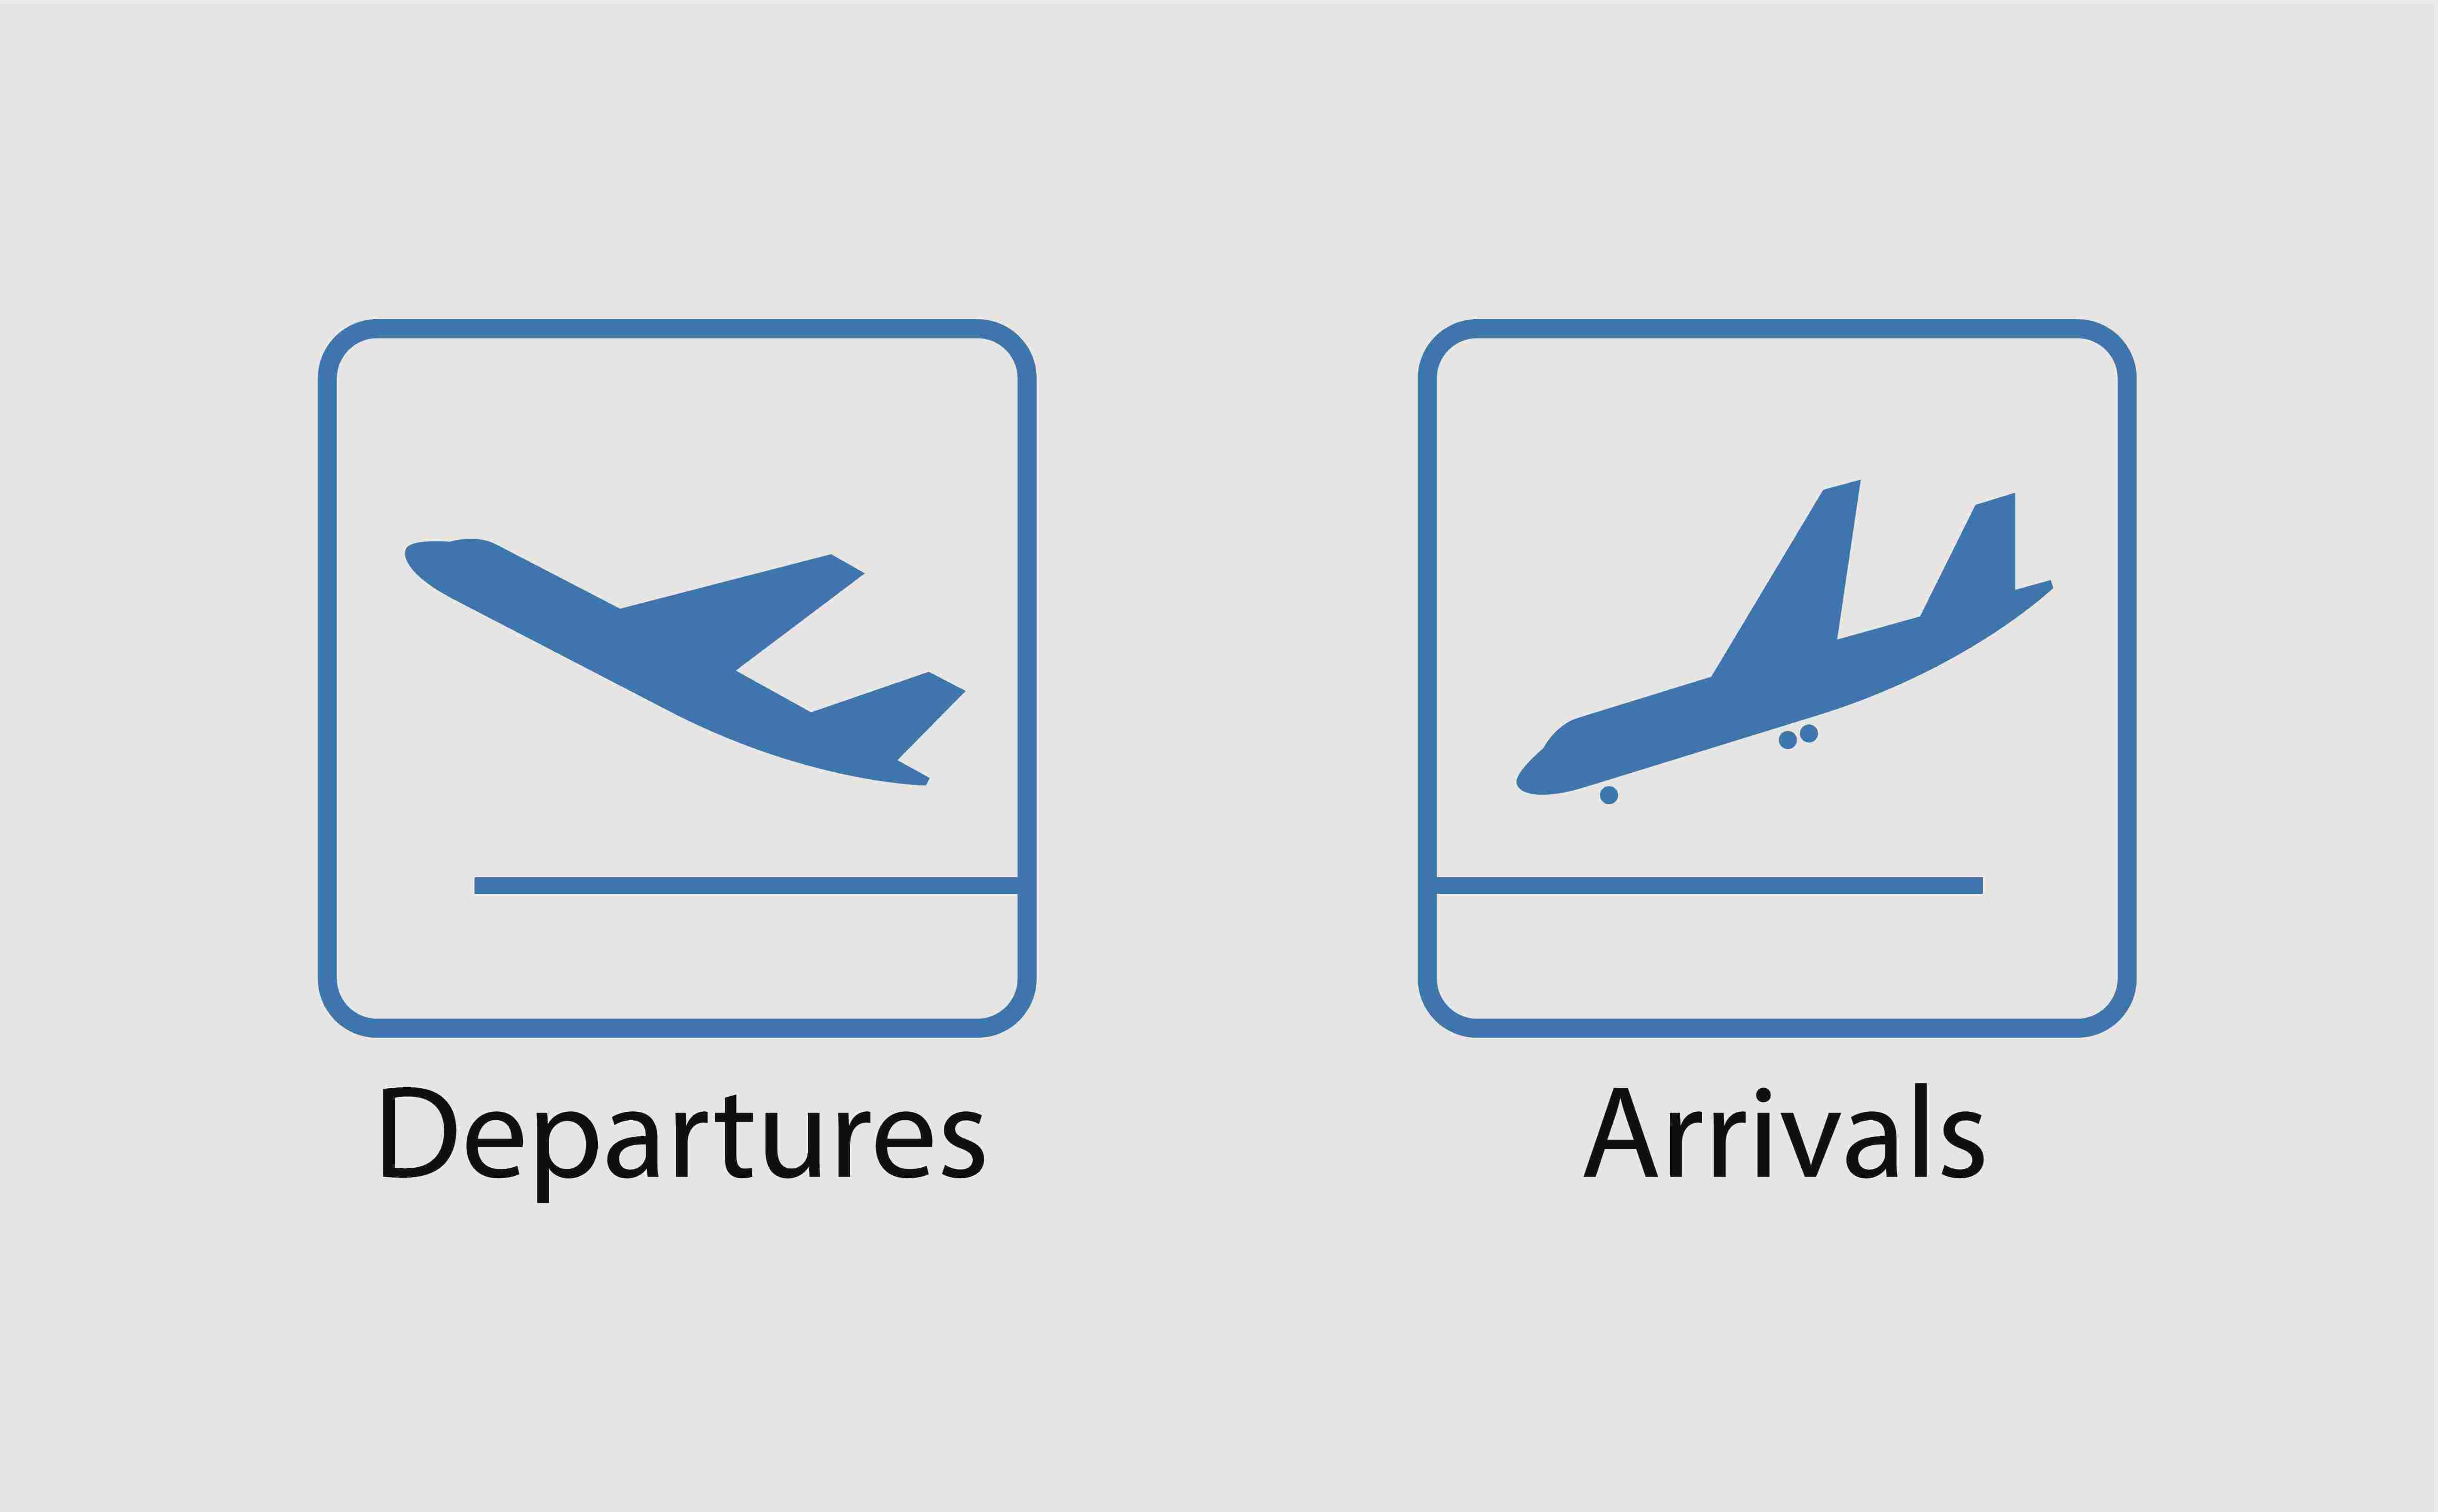 Departures and arrivals symbol